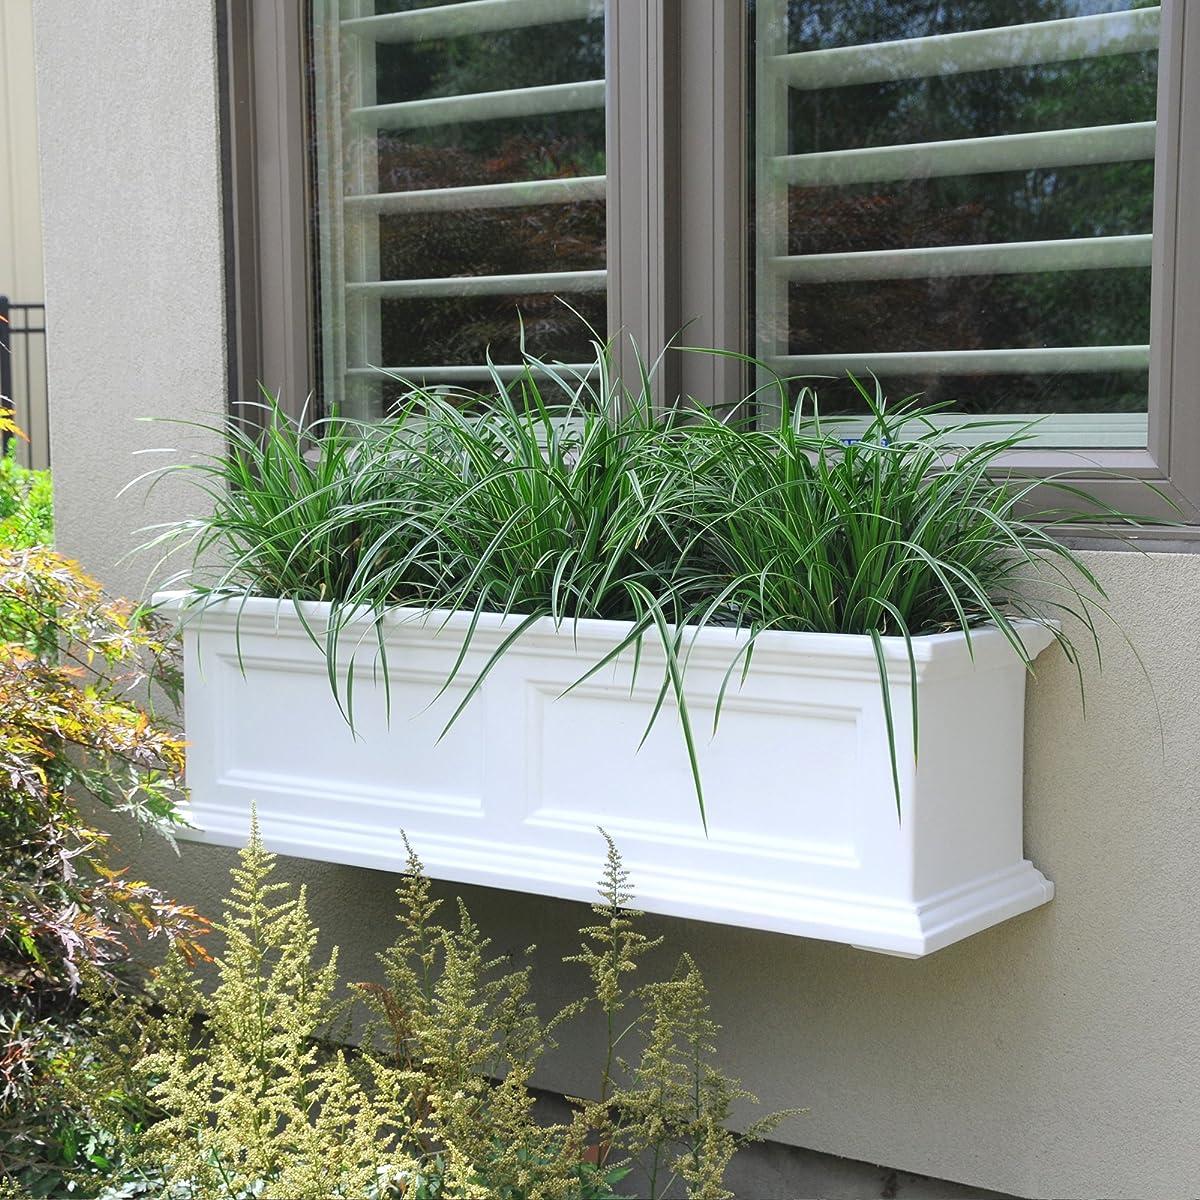 Mayne Fairfield 5822W Window Box Planter, 3-Foot, White